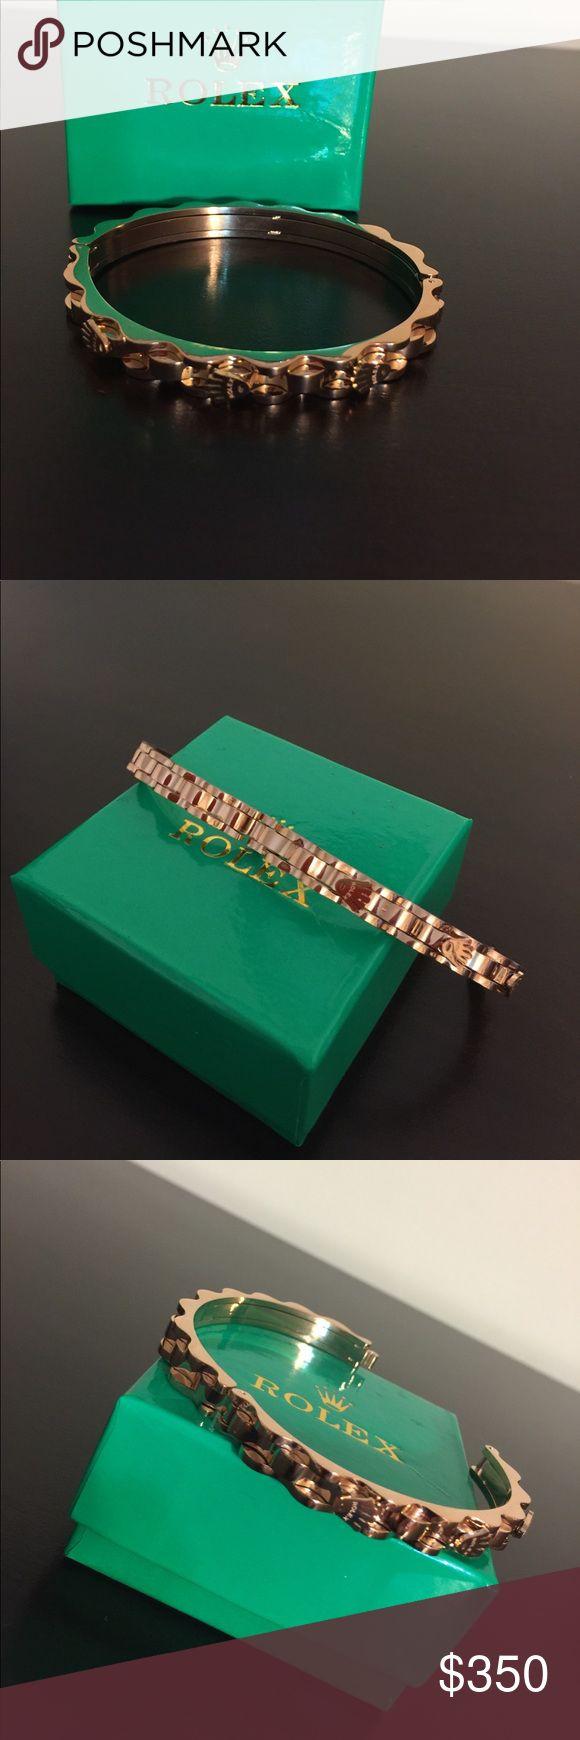 ROLEX Rolex bracelet rose gold plated brand new Rolex Other